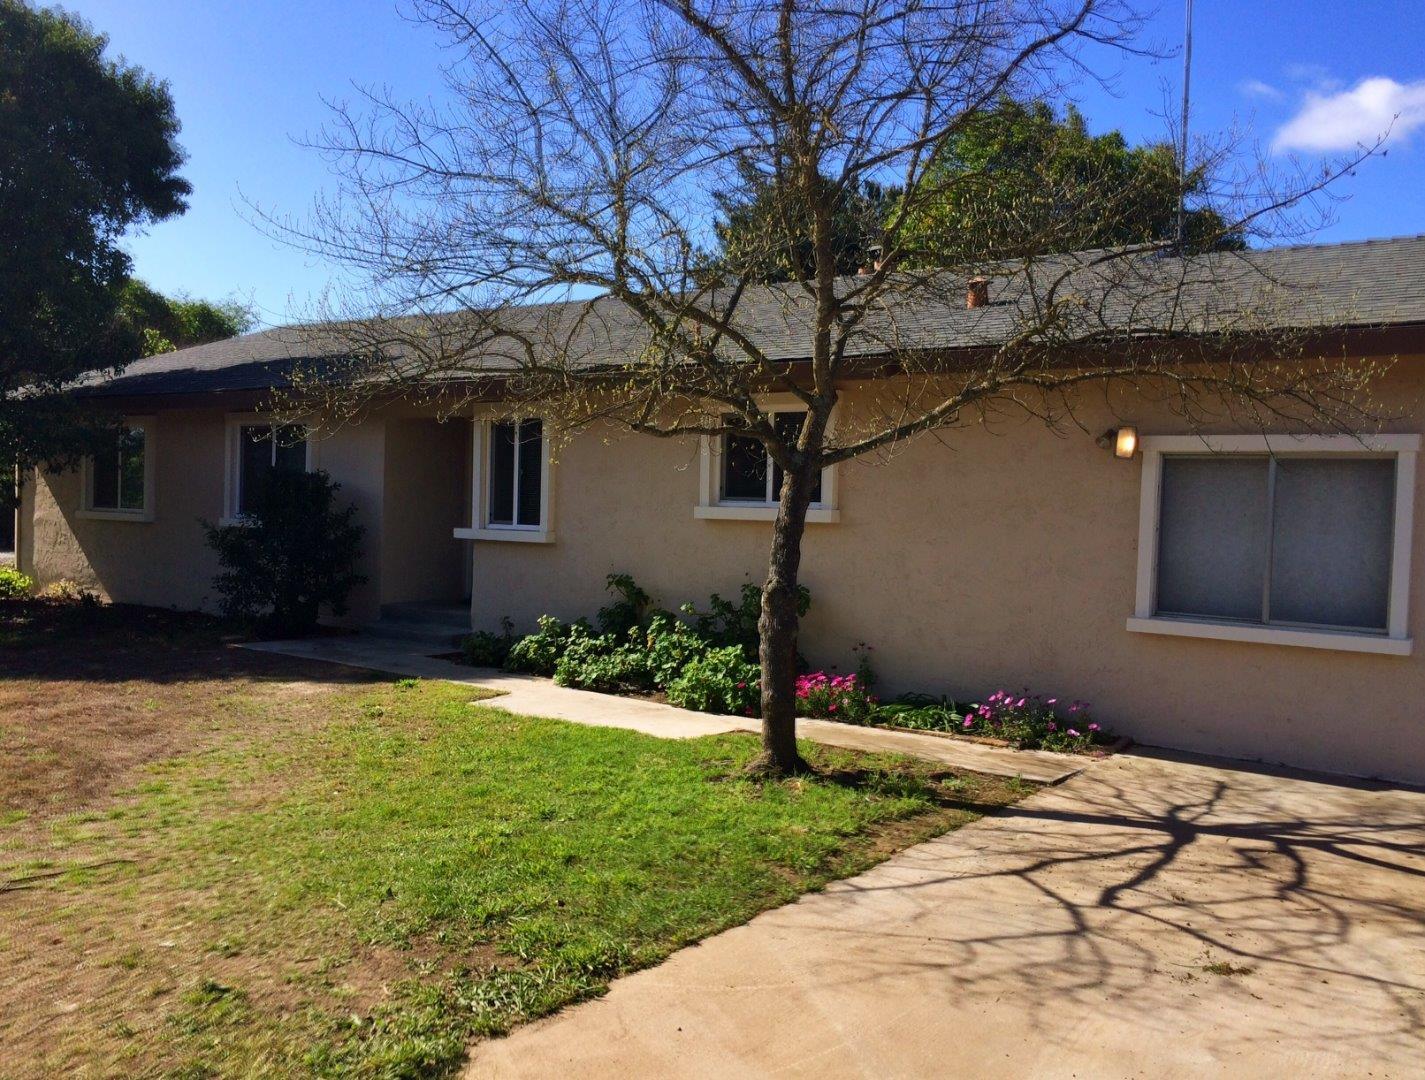 14675 Country Ln, Morgan Hill, CA